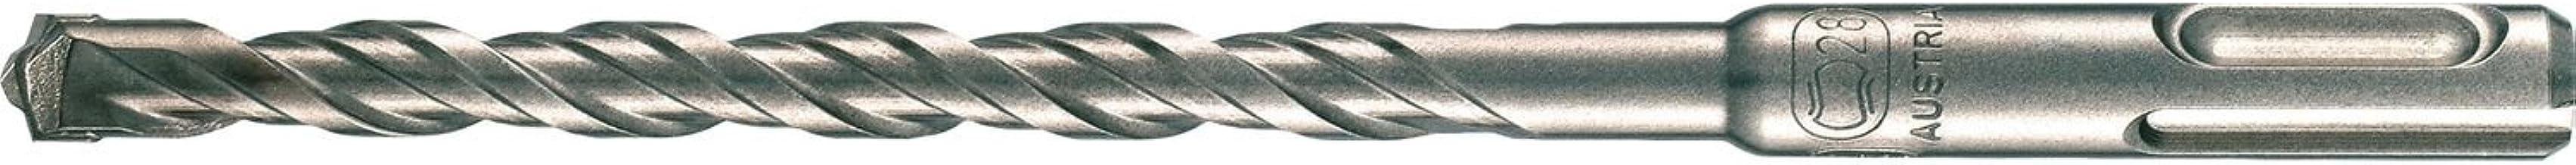 Bosch 1 618 596 259 Hamerboor SDS-plus-5-16 x 400 x 465 mm (1 stuk)